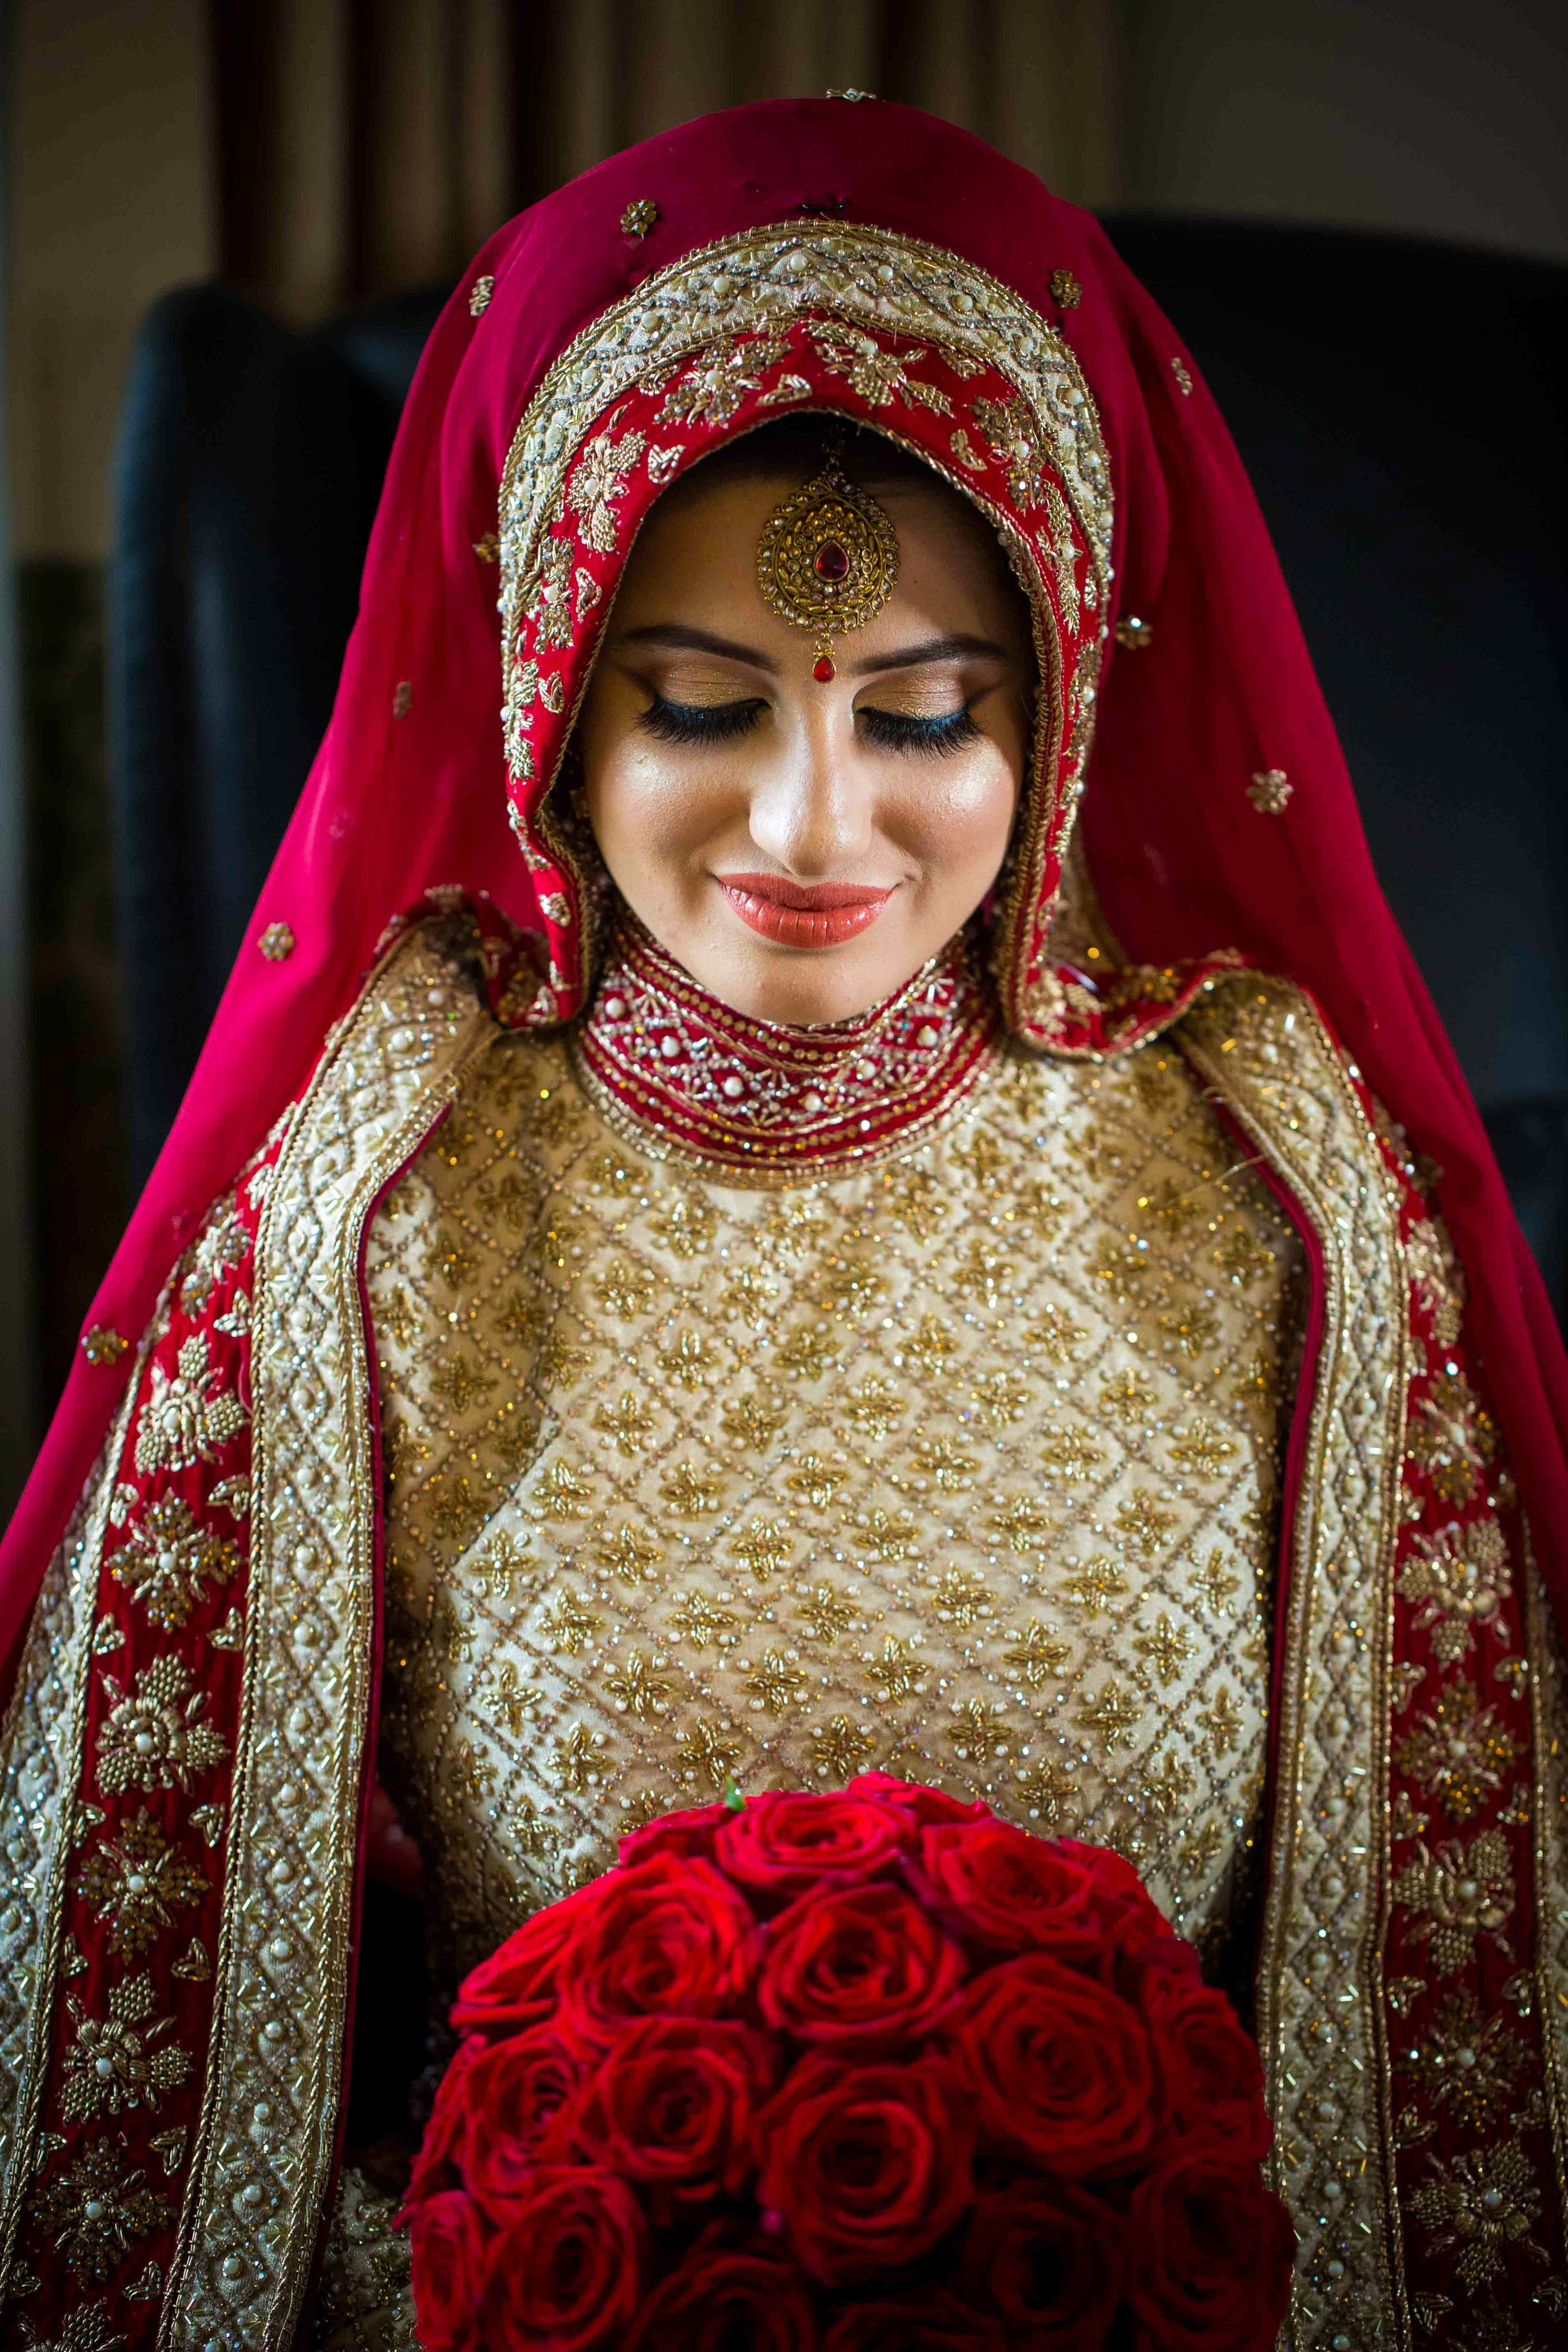 Macdonald-Berystede-Hotel-wedding-female-asian-wedding-photographer-london-natalia-smith-photography-8-2.jpg